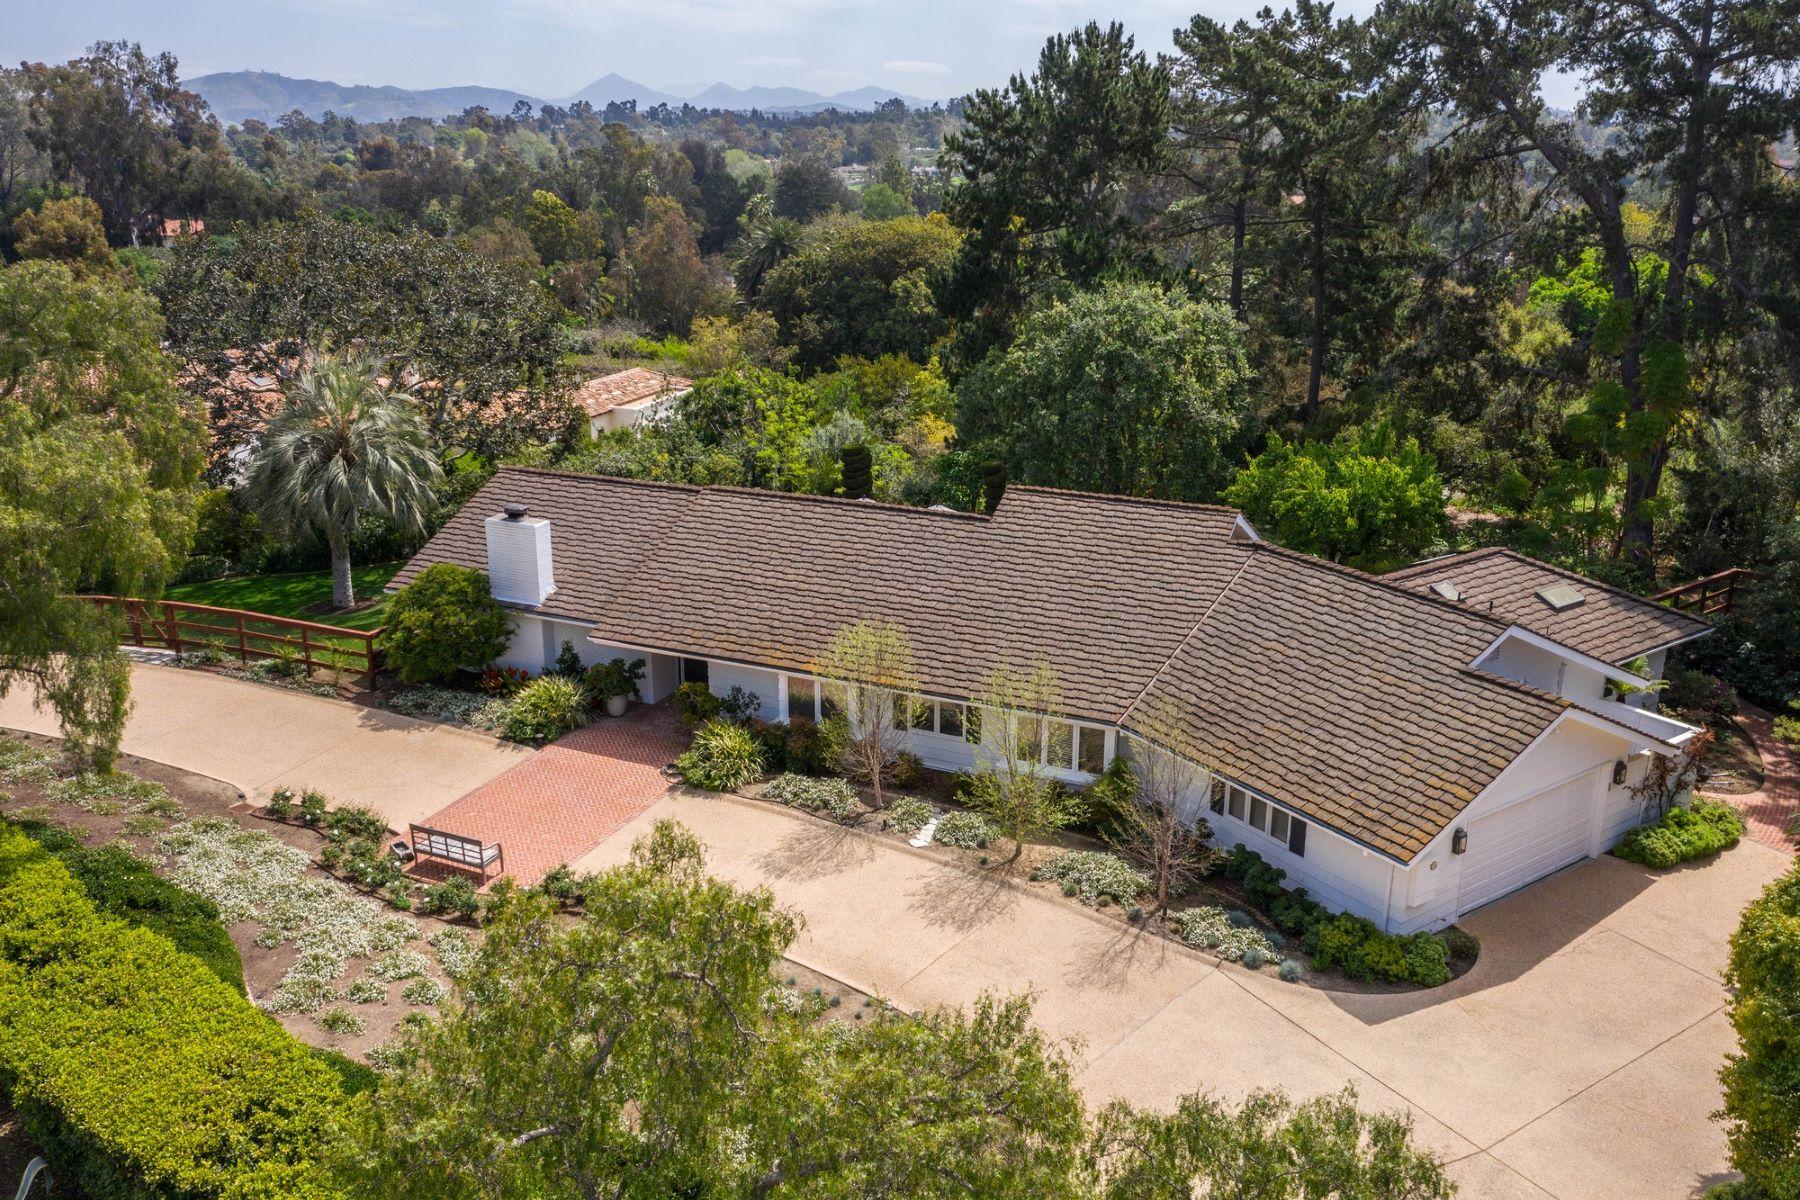 Property for Sale at 6055 Lago Lindo Rancho Santa Fe, California 92067 United States